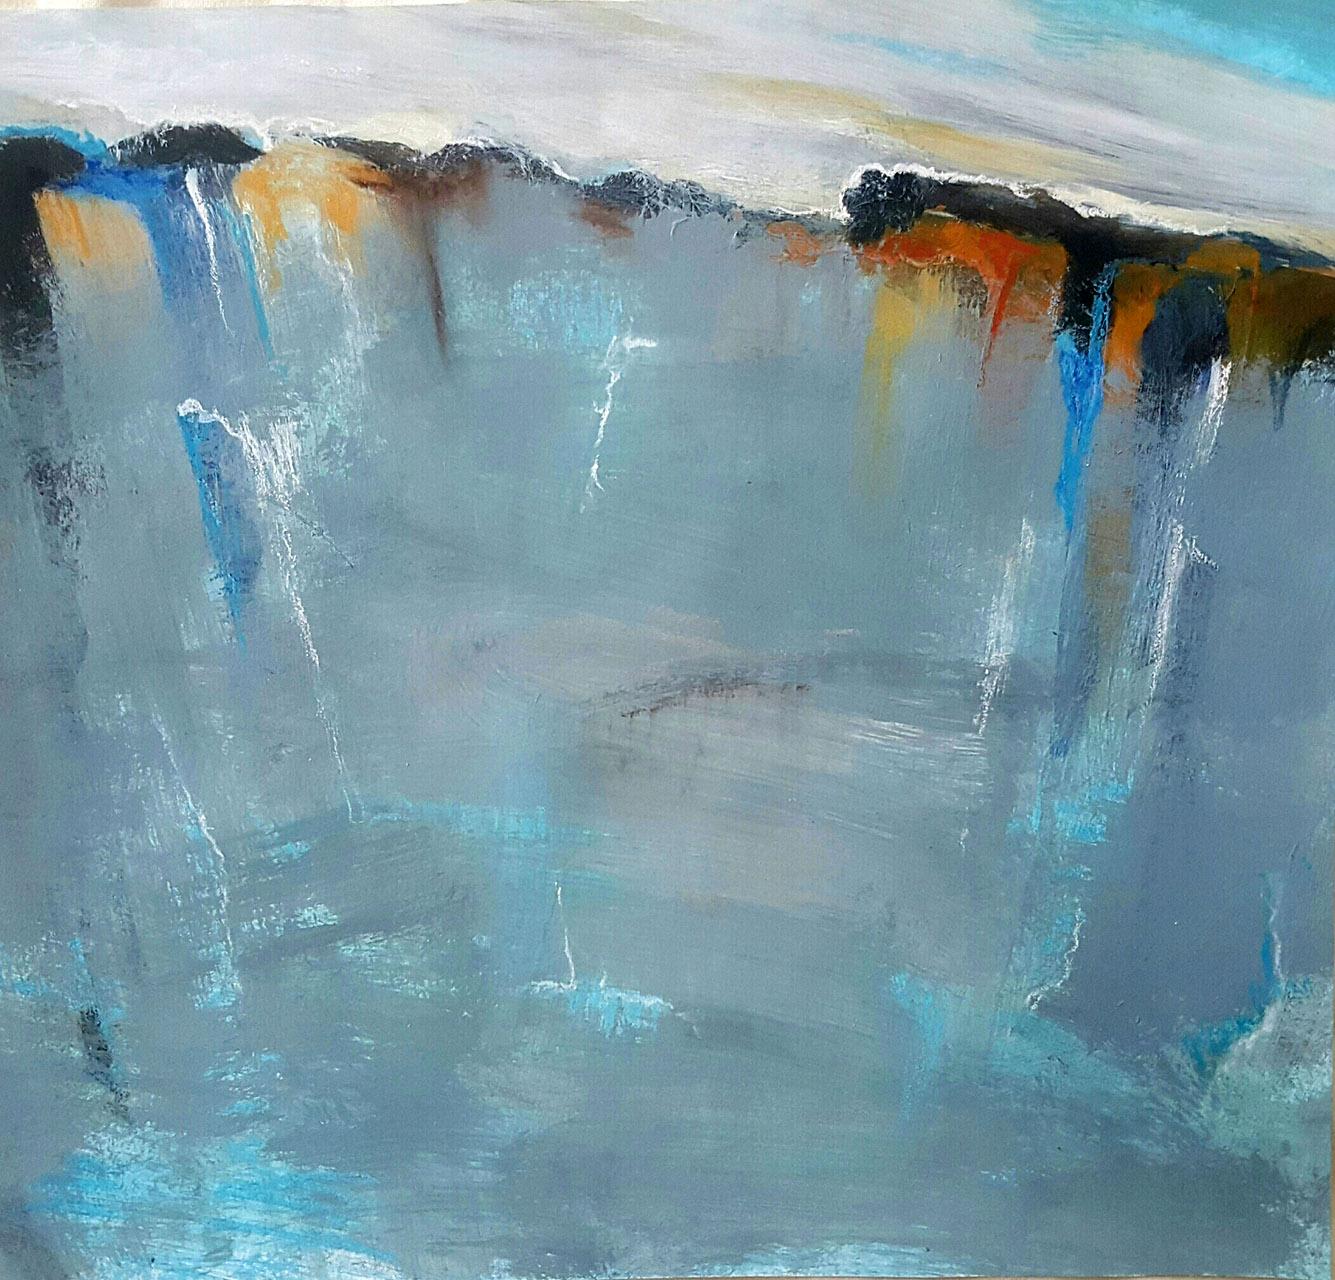 Hans Kuipers_Perito Moreno_acryl op papier_30x30